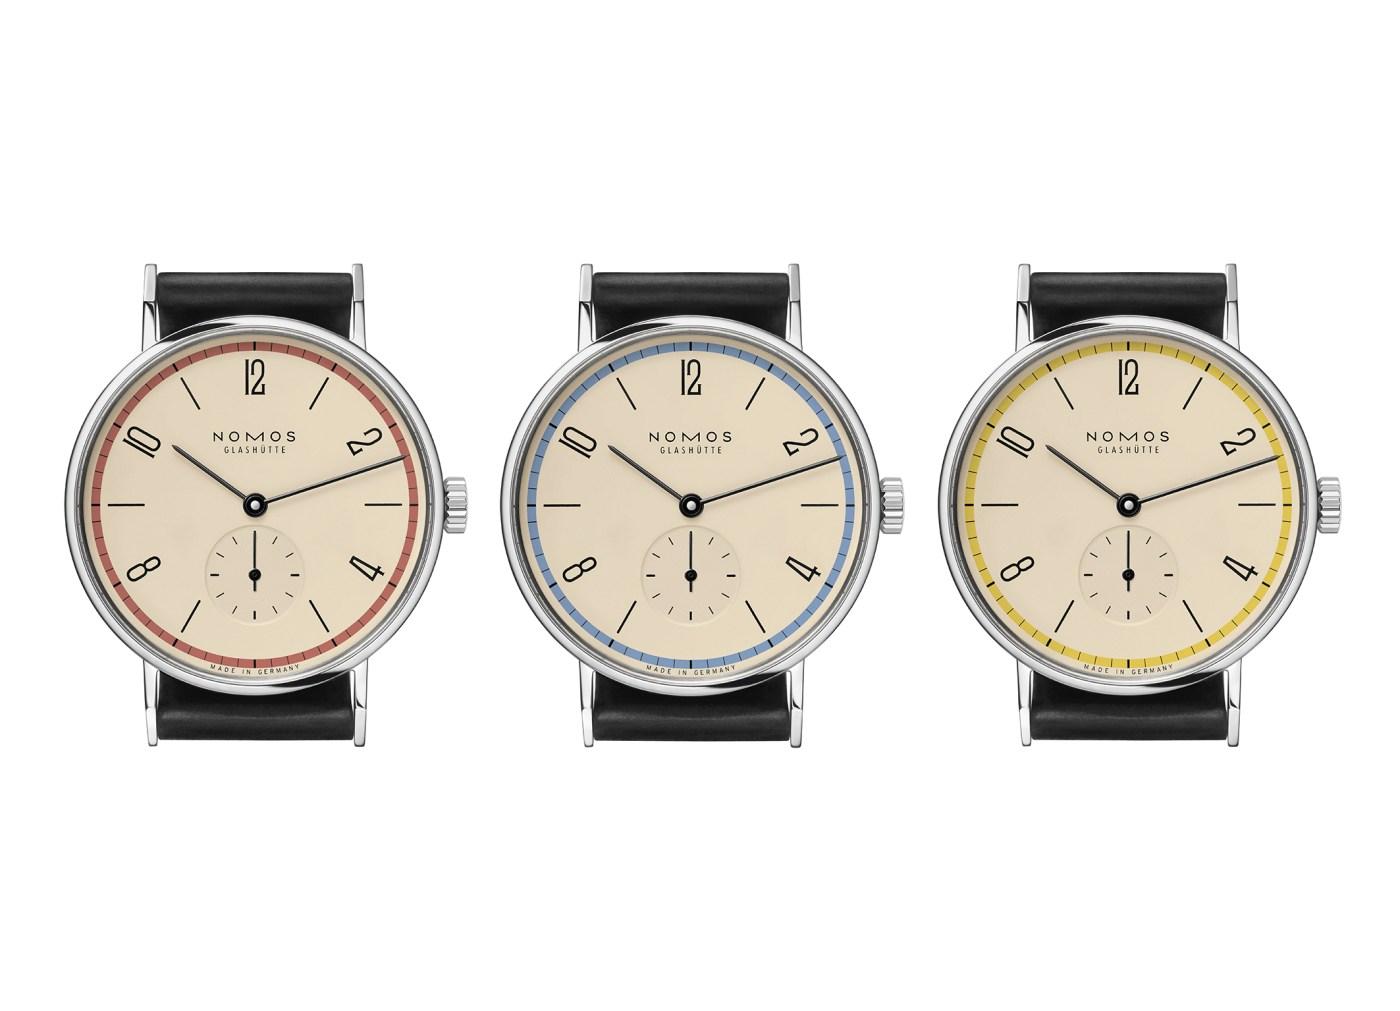 NOMOS Glashütte Tangente Limited Edition